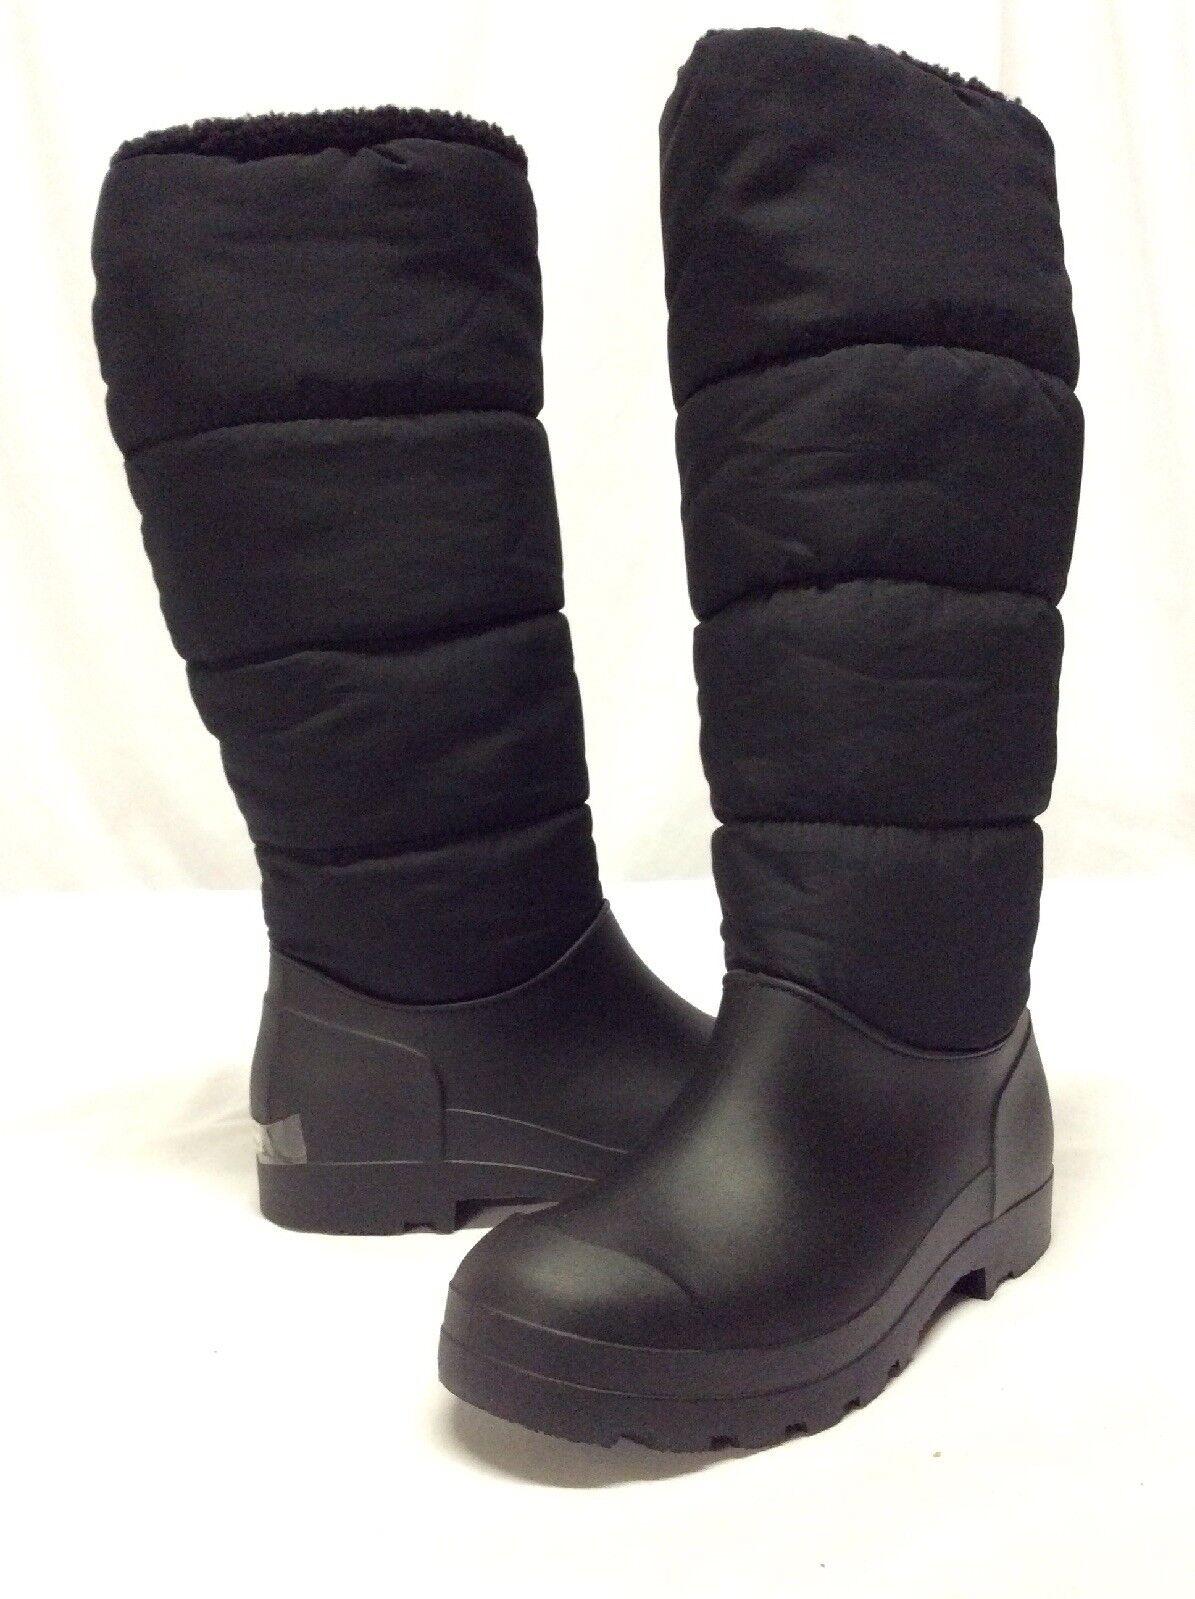 250 Retail Dirty Laundry Women's Winter Boots, Black, Size 8 Eur 38.5